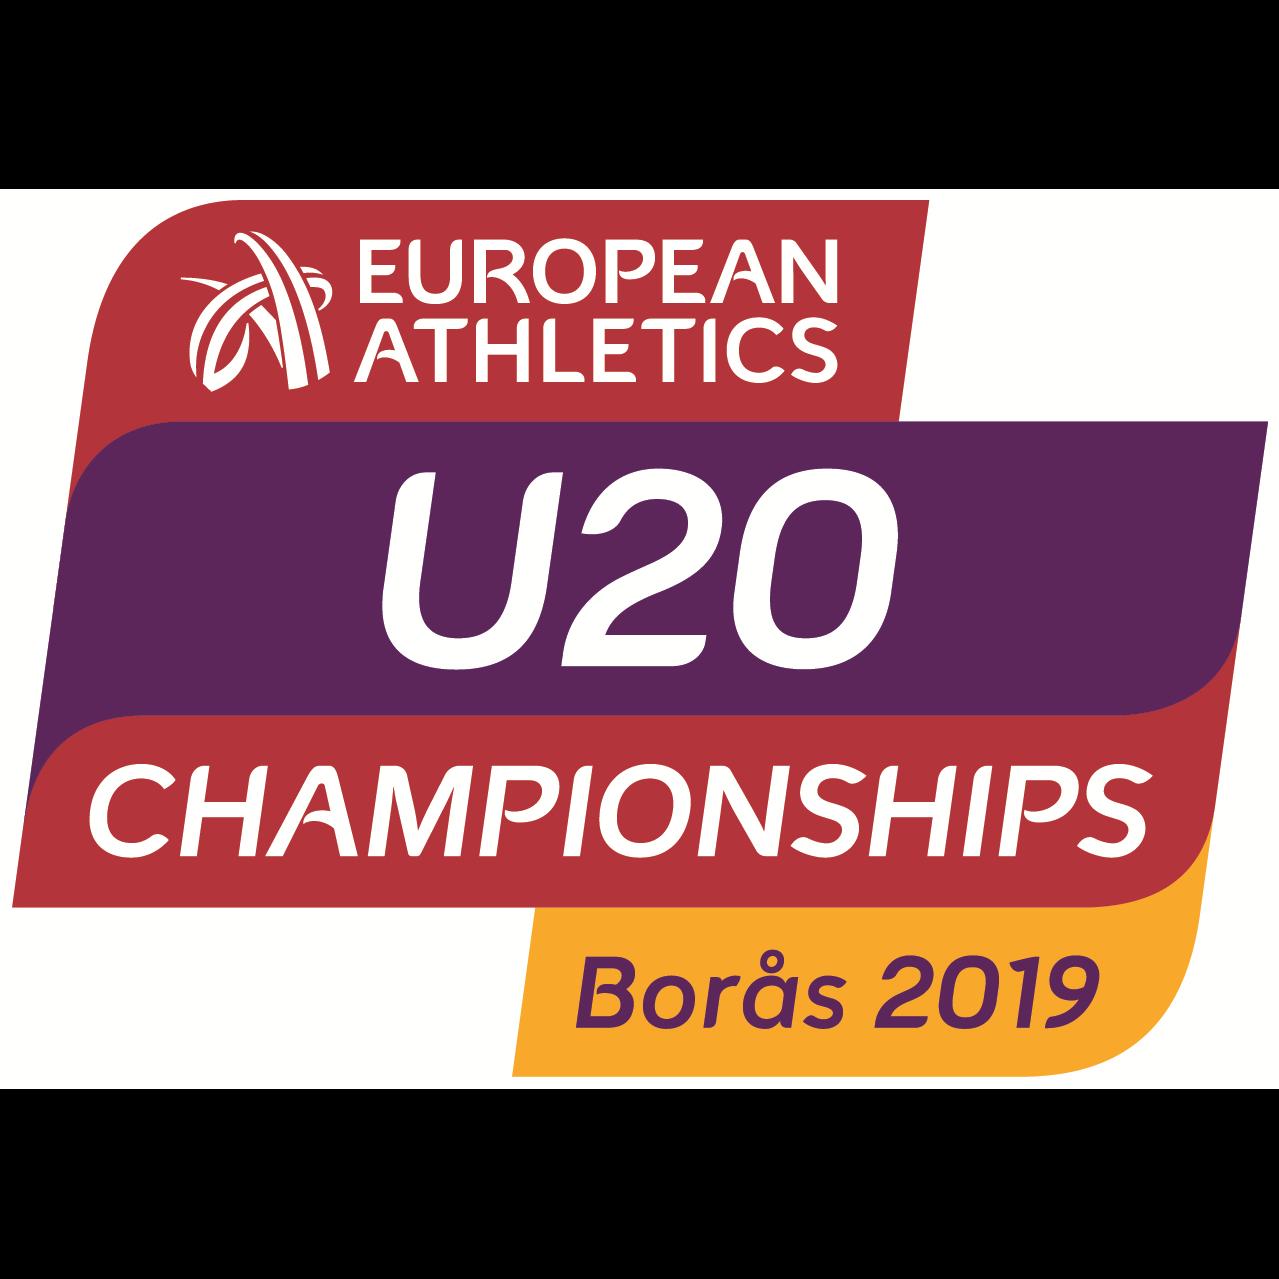 2019 European Athletics U20 Championships